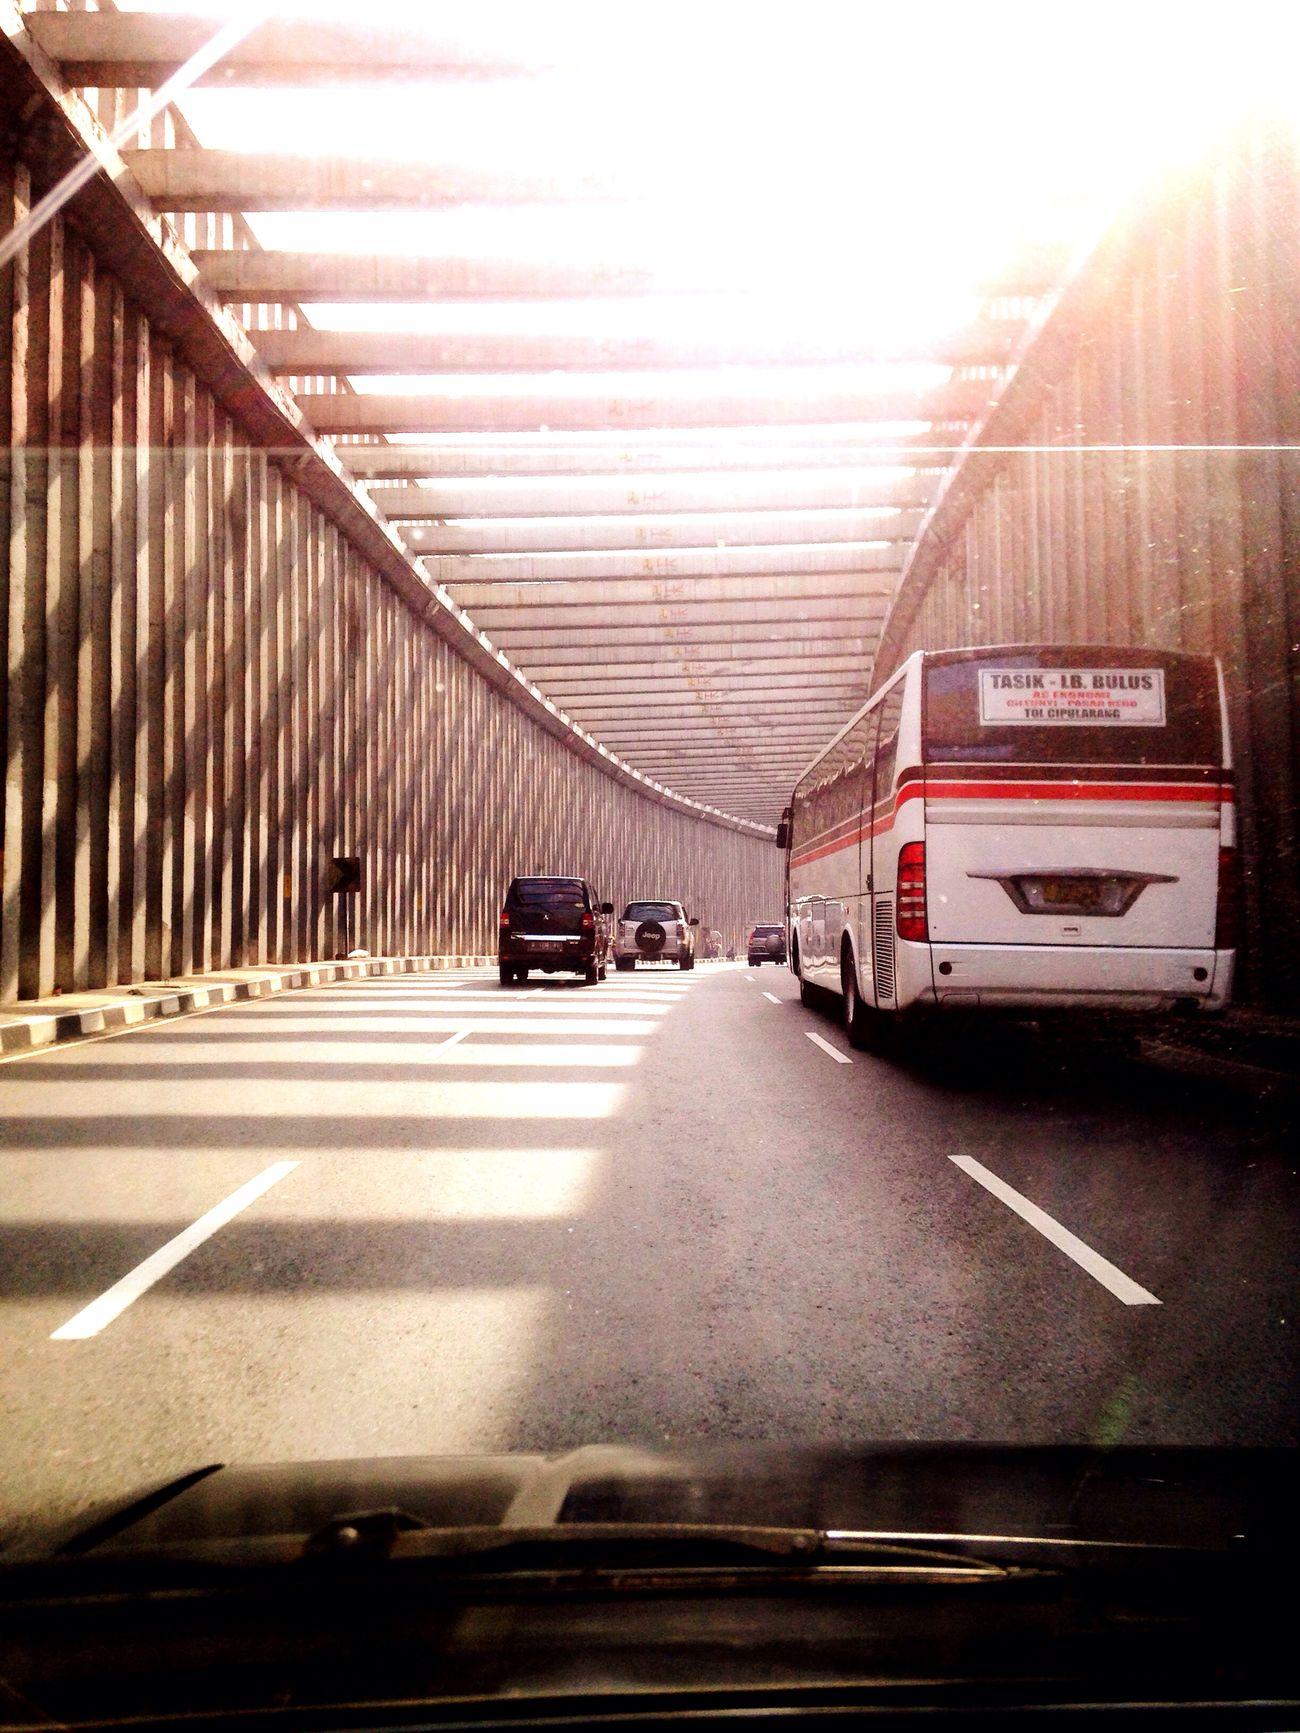 Lingkar nagreg Tunnel Ontheroad Lifeontheroad